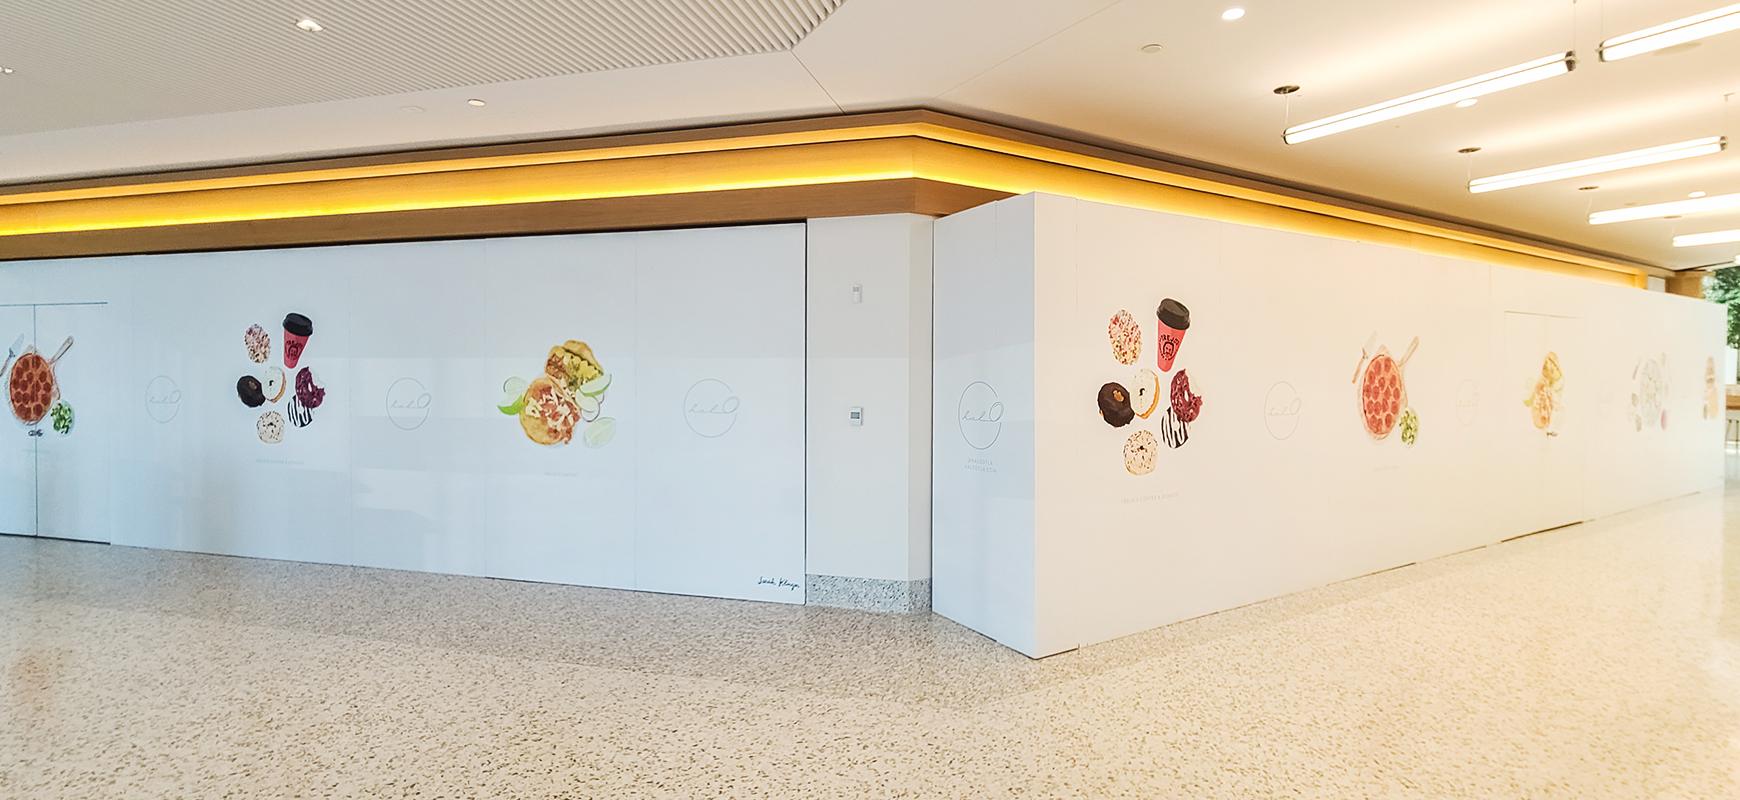 Halo Restaurant environmental graphics made of opaque vinyl for interior wall decor